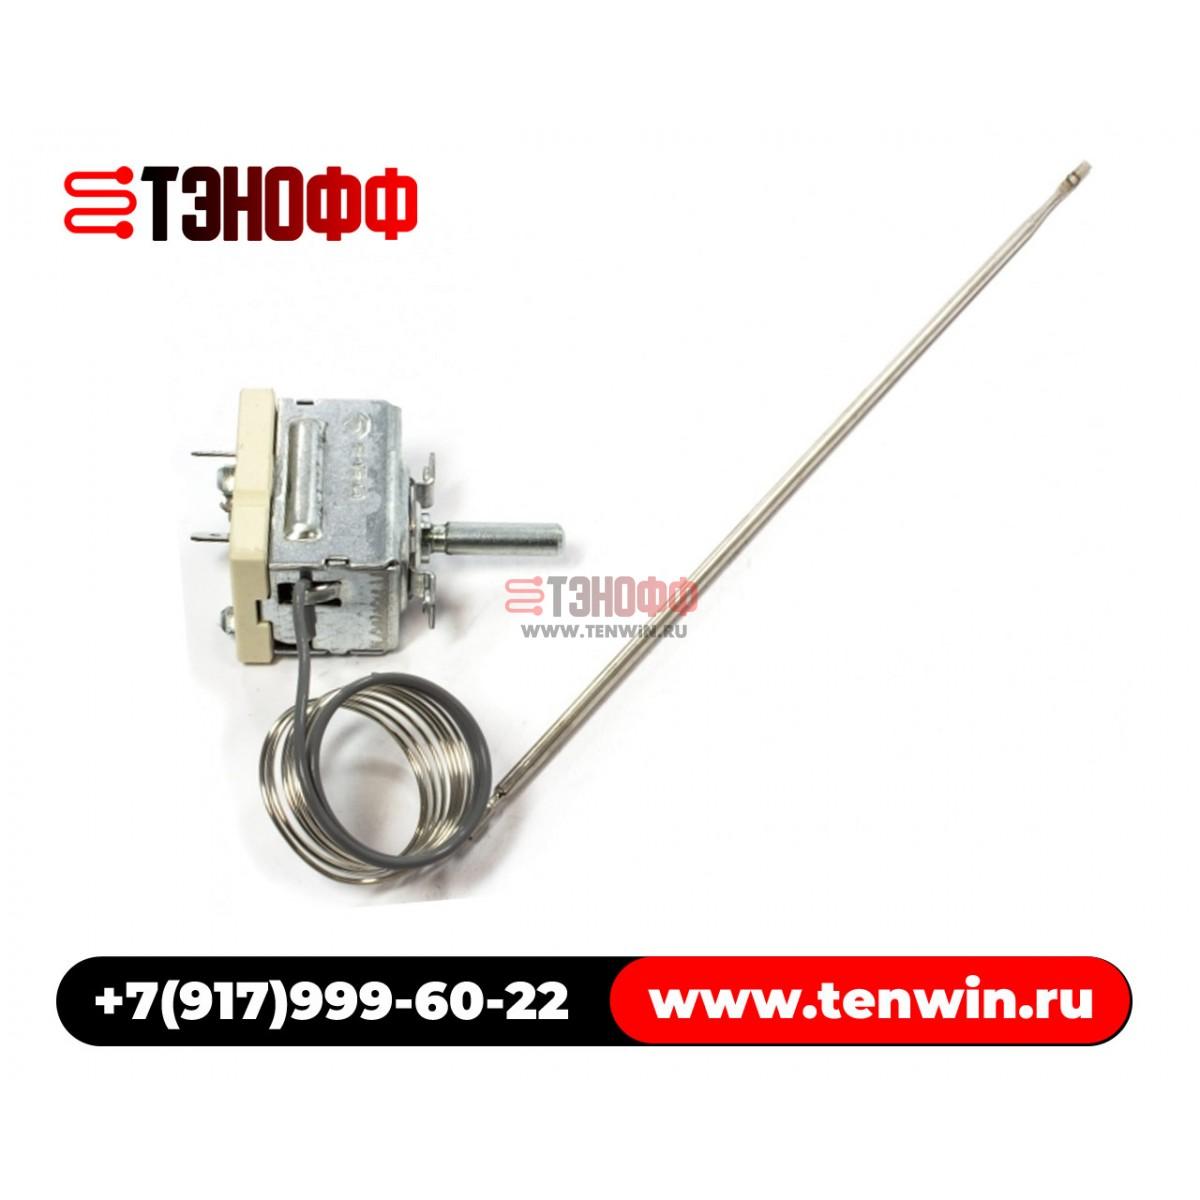 Терморегулятор 299гр. / EGO 55.17069.140 духового шкафа